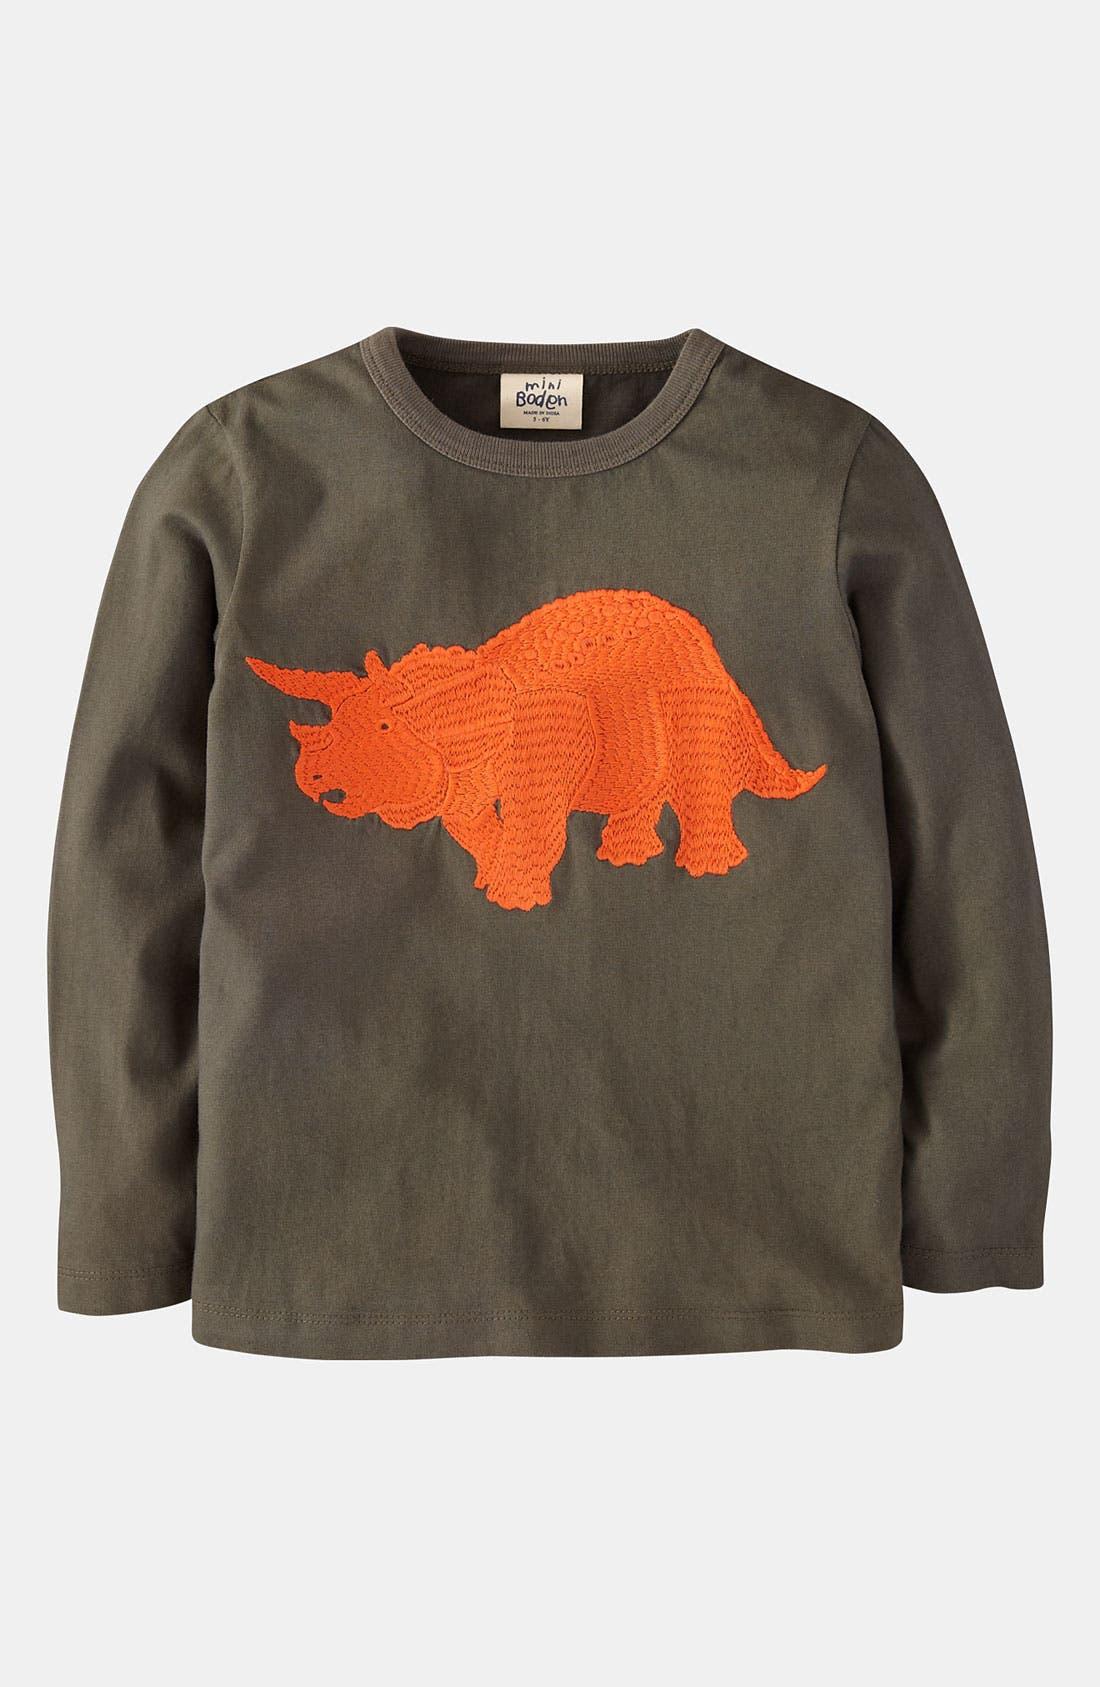 Main Image - Mini Boden 'Super Stitch' T-Shirt (Toddler)